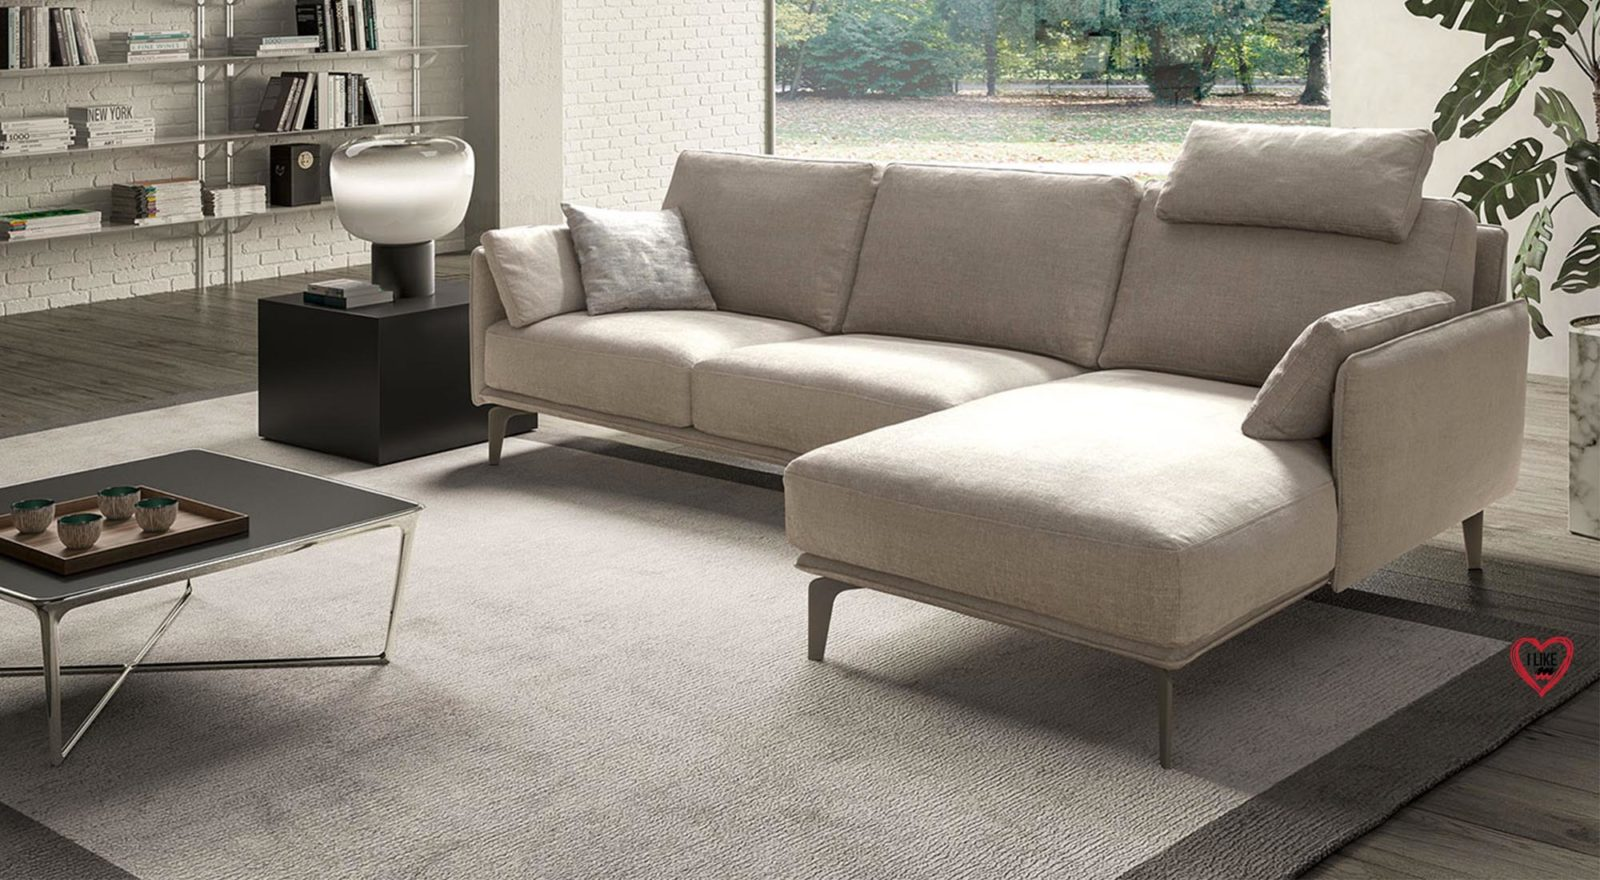 Divani in tessuto divani due posti e angolari for Divano minimal